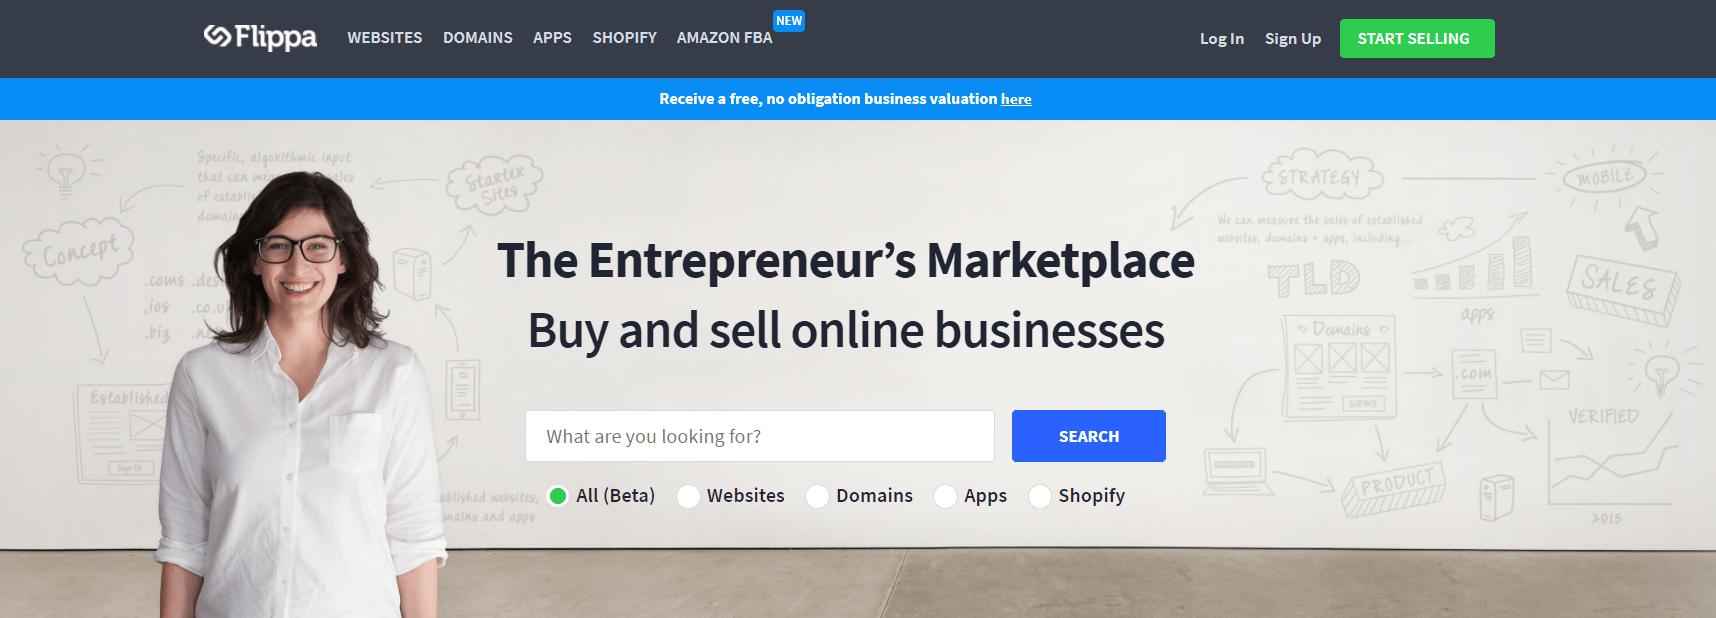 Онлайн-сервис Flippa